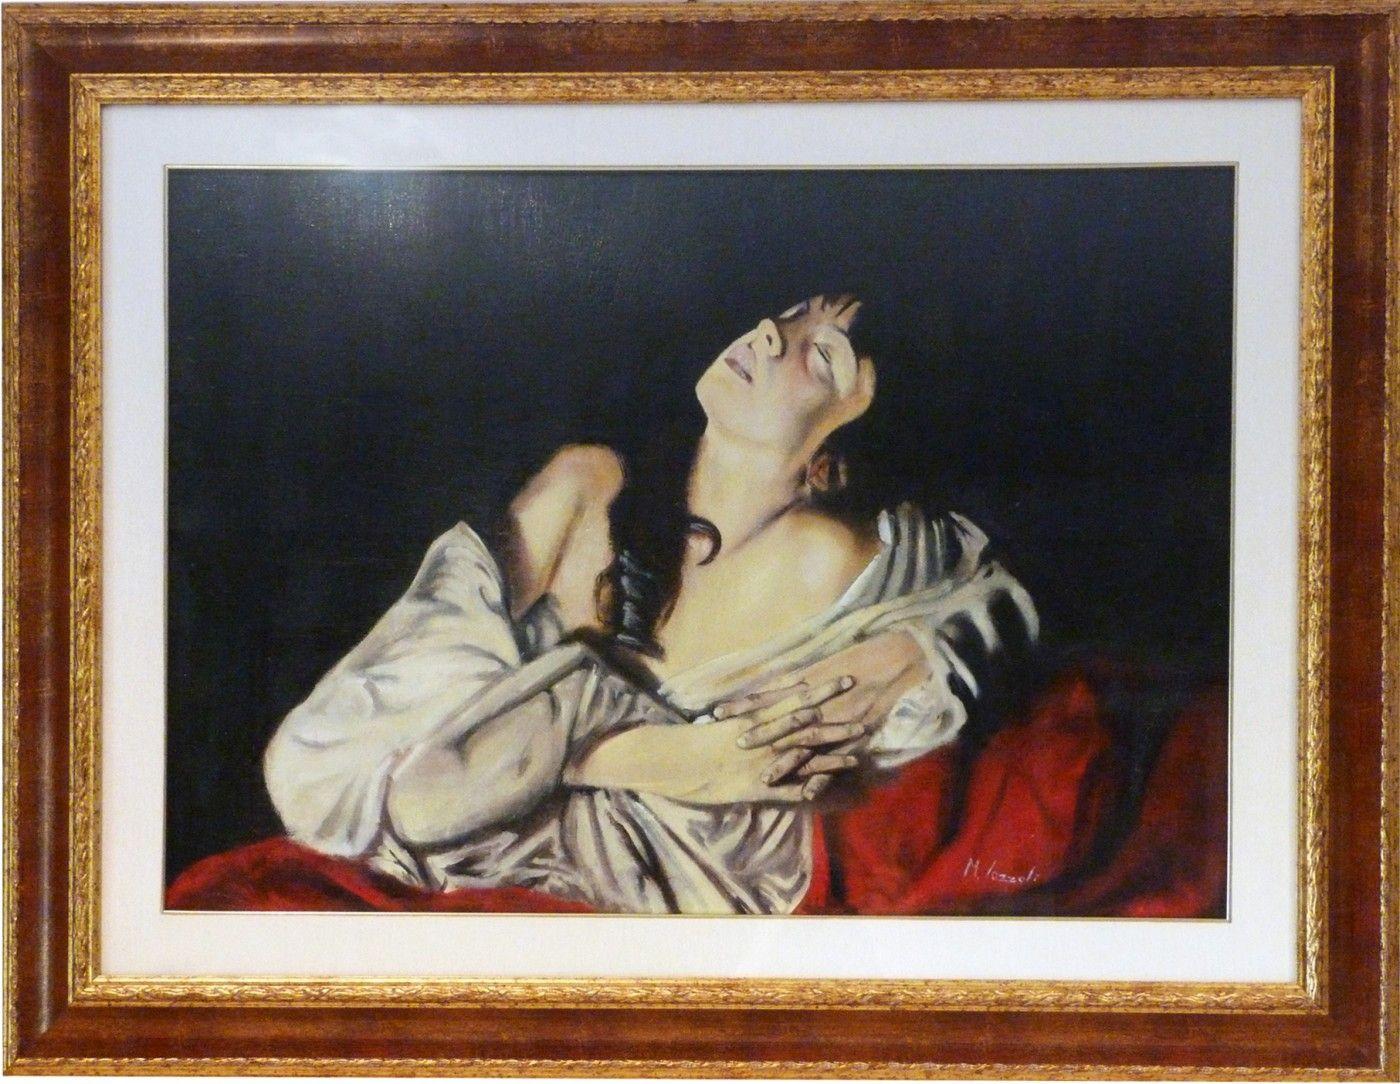 Painting: Maddalena of Marco Iazzoli